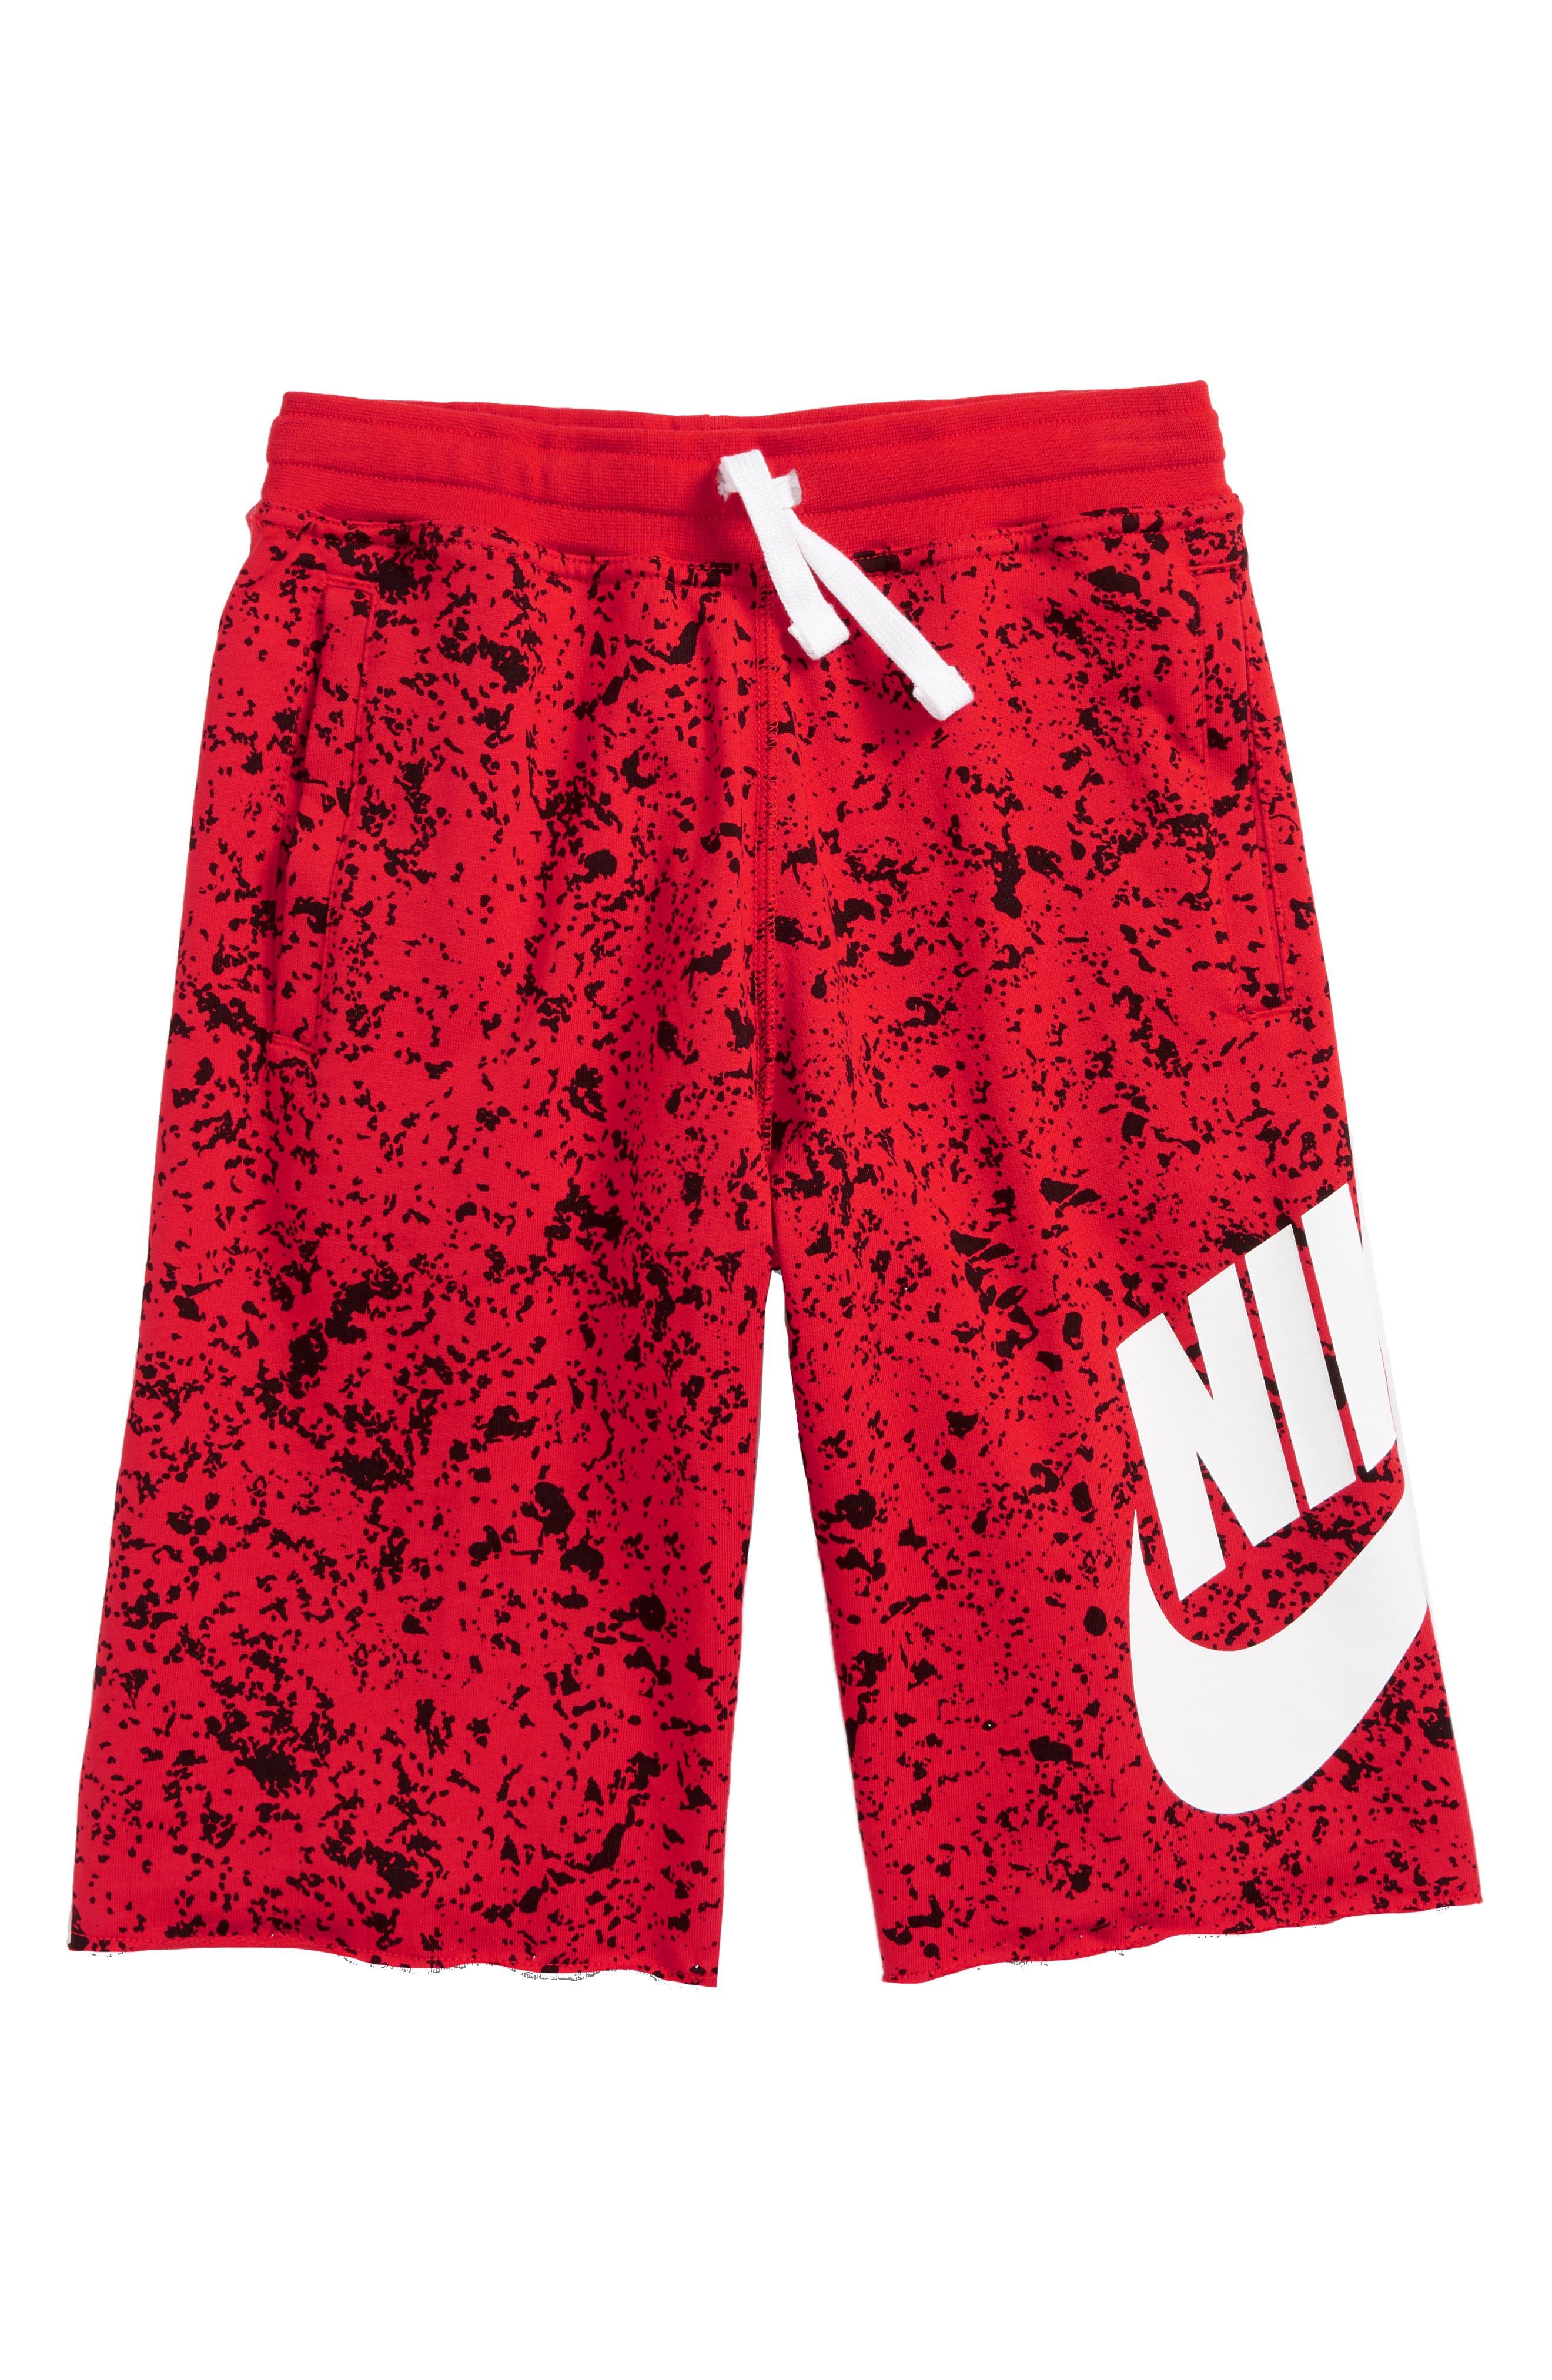 Sportswear Alumni Shorts,                             Main thumbnail 4, color,